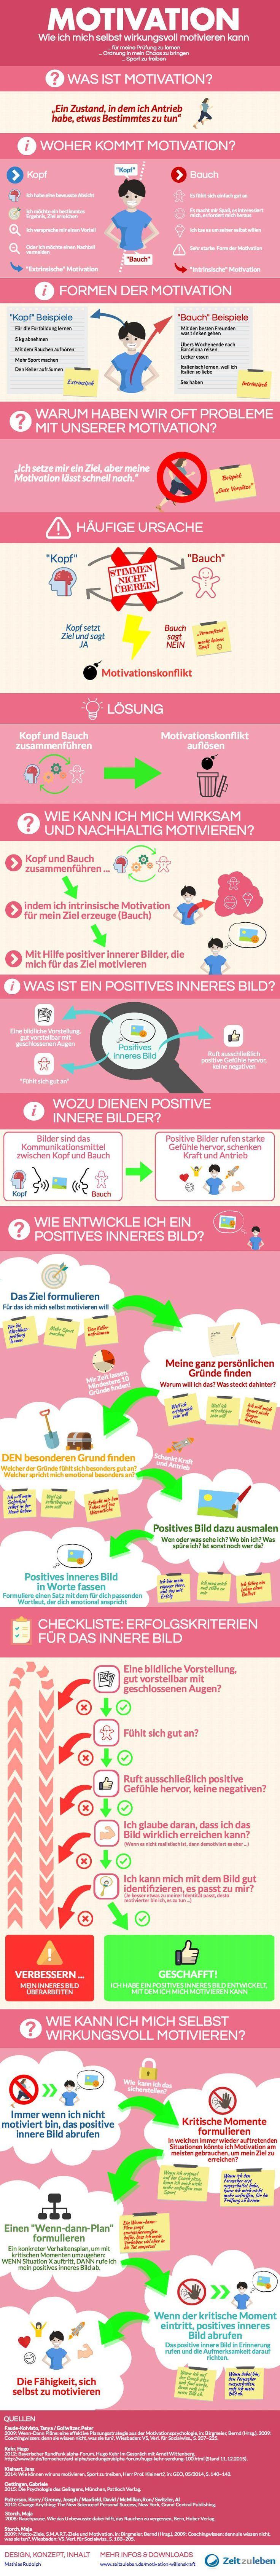 Infografik Motivation Wie Kann Ich Mich Selbst Motivieren Ich Infografik Kann Mich Motivation Motivieren Selbst Wi Motivation Infografik Motivieren